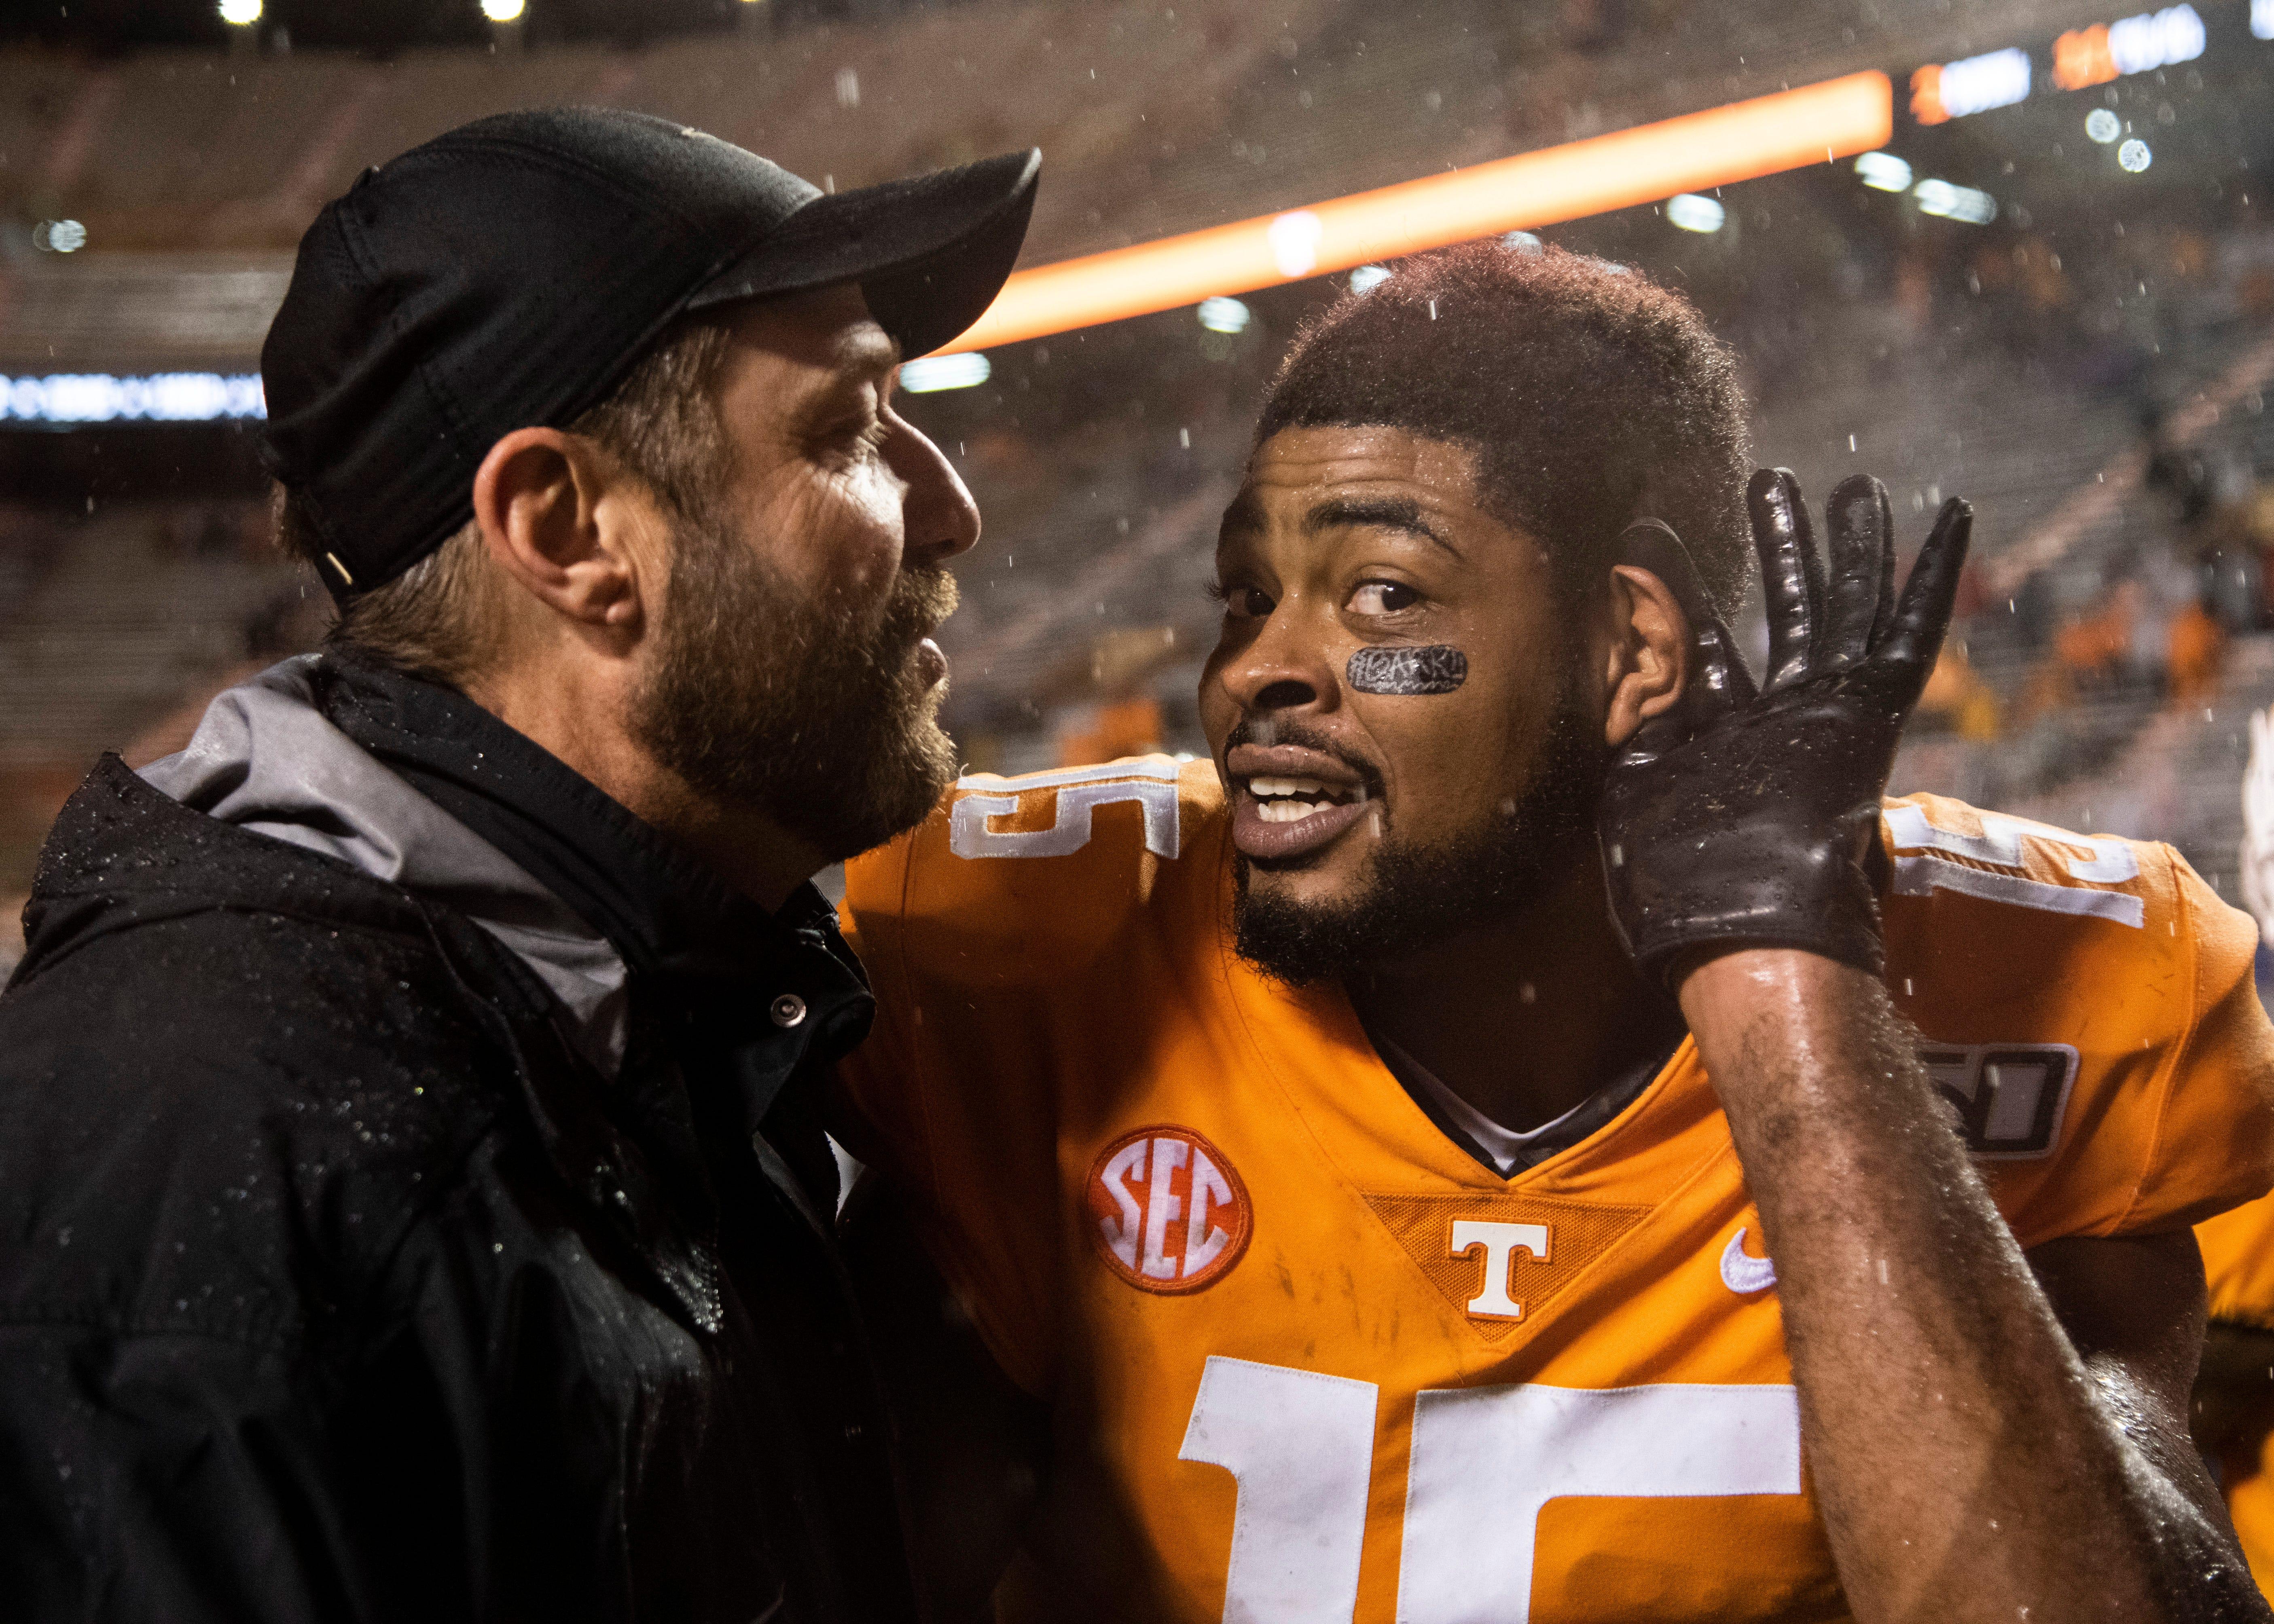 Tennessee's Jauan Jennings steps on face of Vanderbilt player after sideline collision